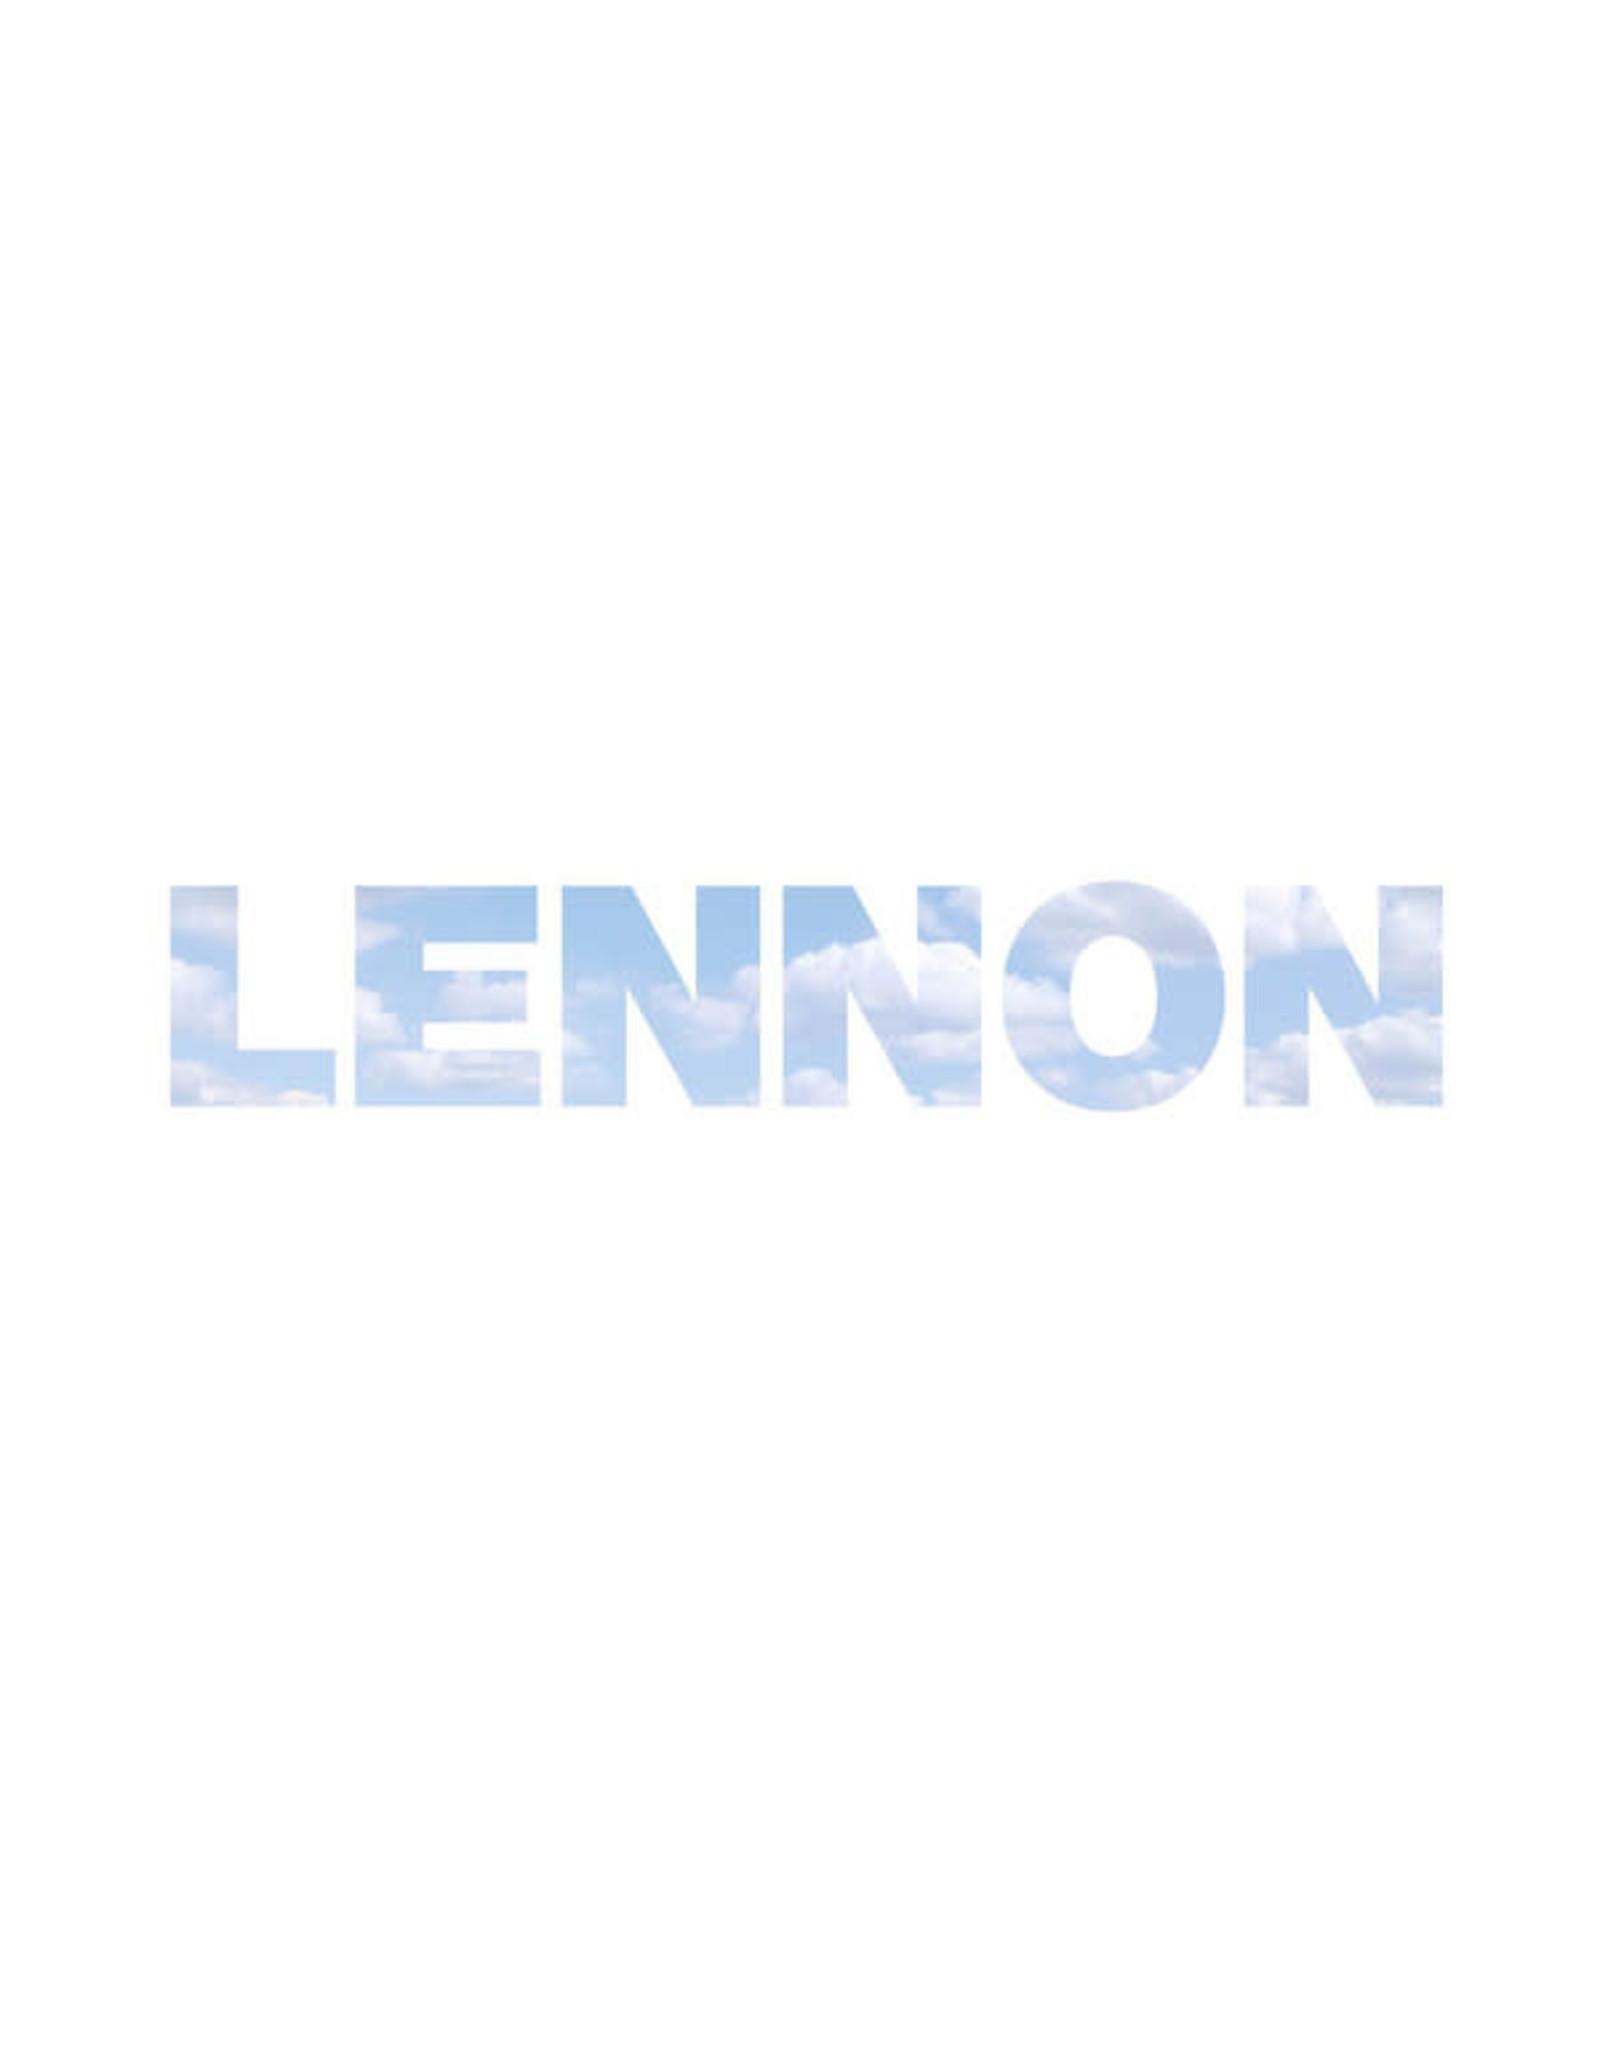 Lennon, John - Lennon (8 Studio Album LP Box Set)